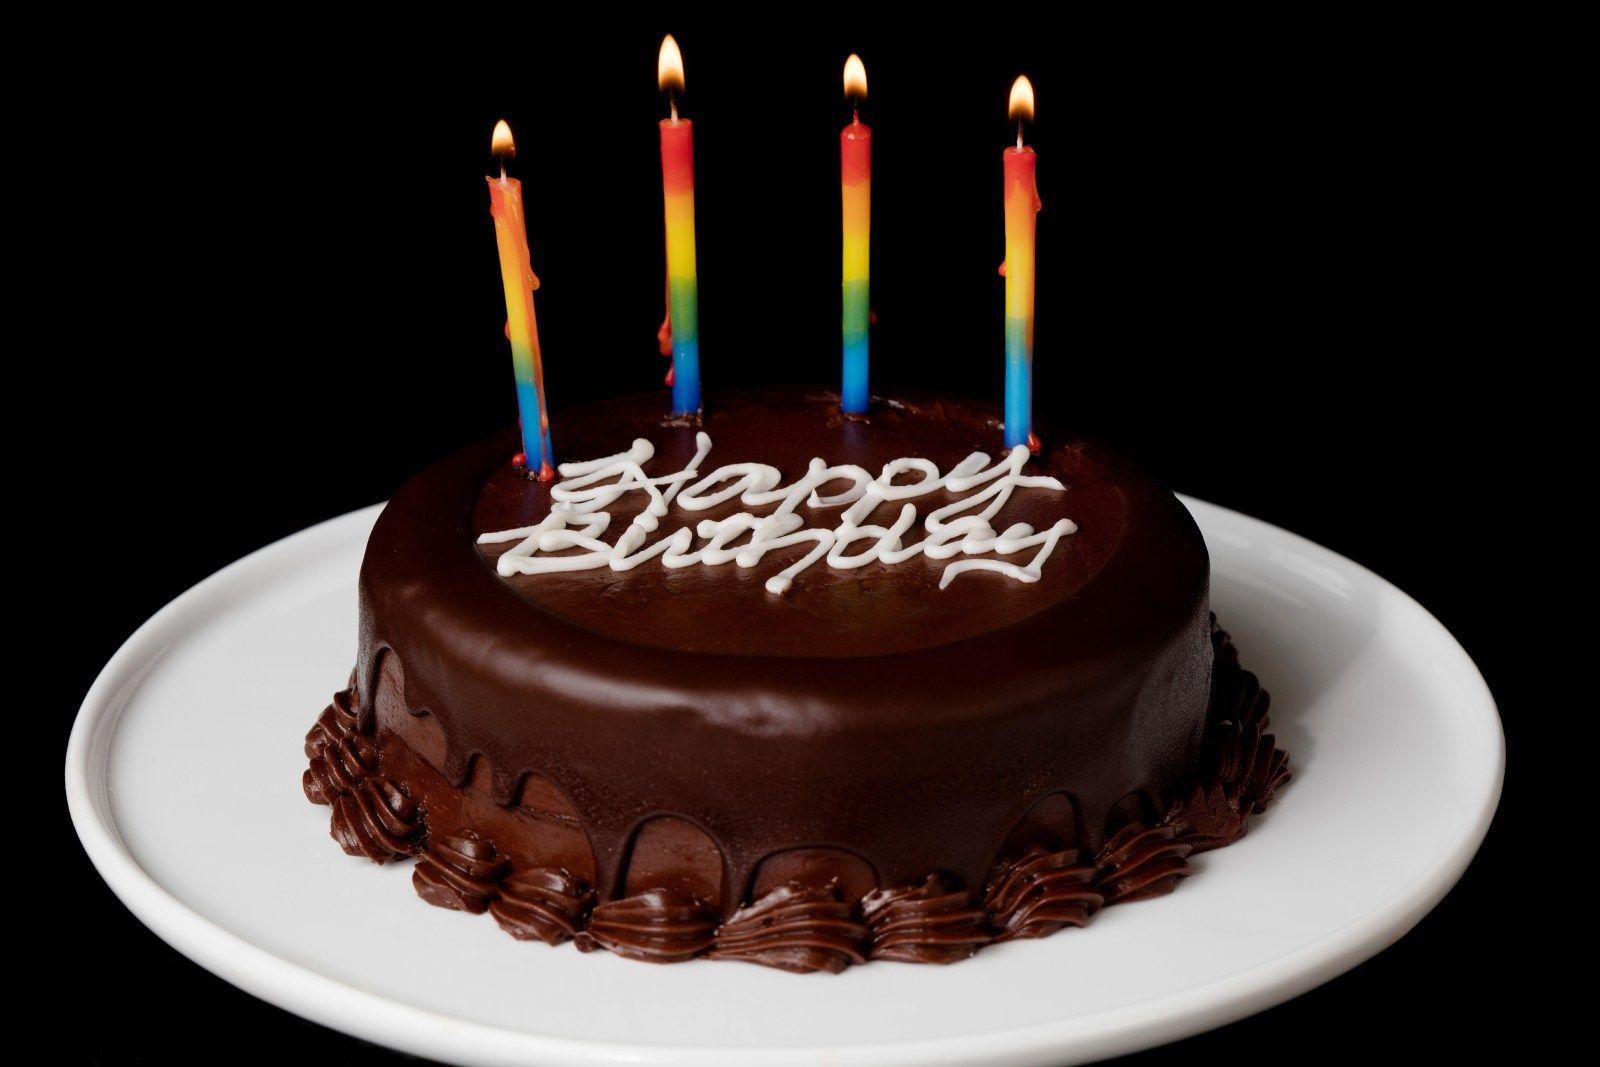 27 Great Image Of Happy Birthday Cake Image Birijus Com Birthday Cake With Photo Birthday Cake Chocolate Online Birthday Cake